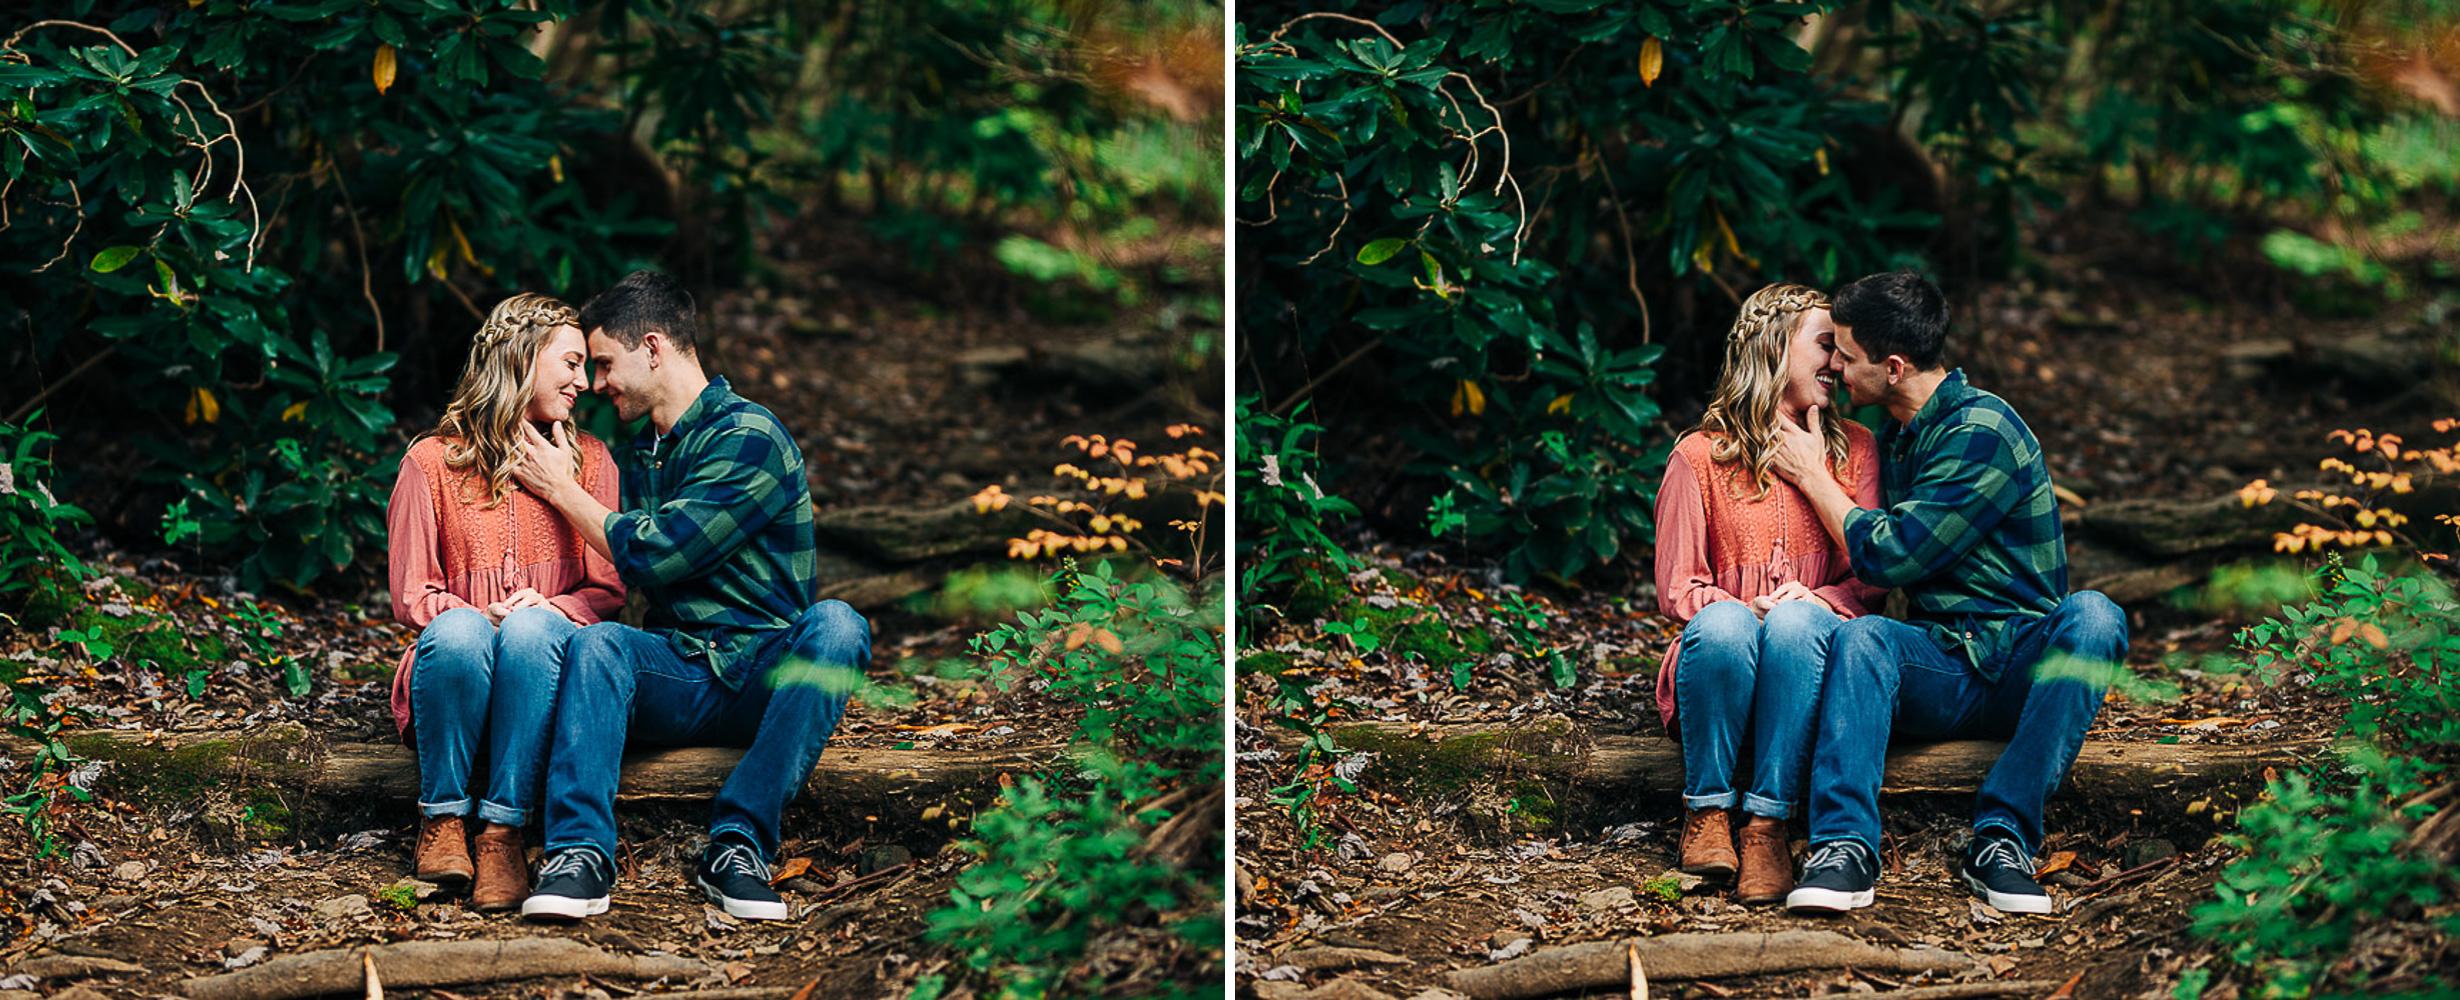 Engagement Portraits 01.jpg